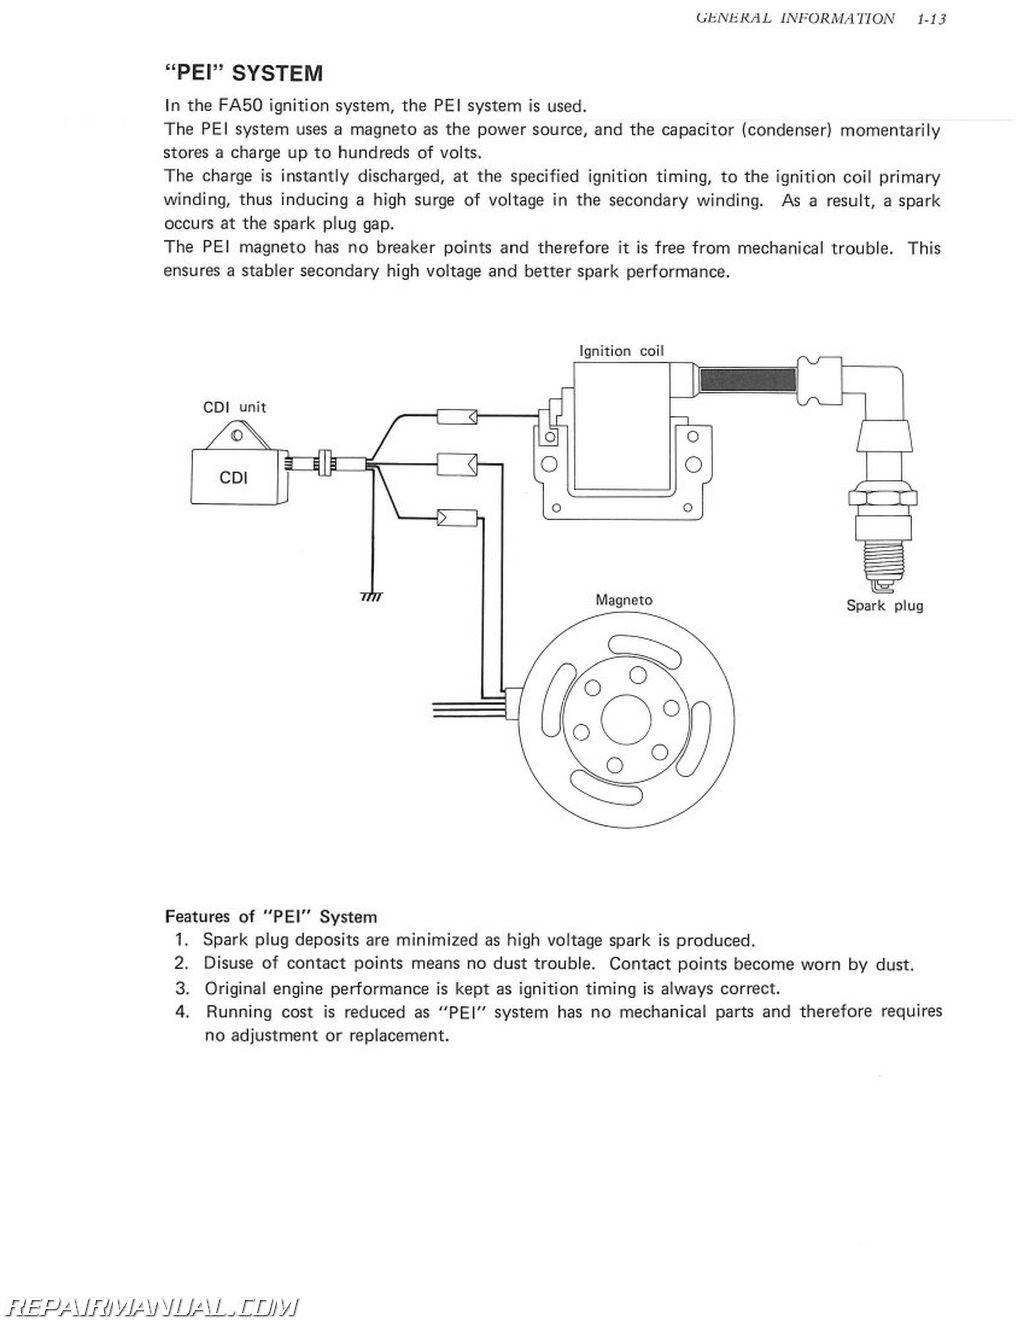 1980 1991 suzuki fa50 moped service manual rh repairmanual com